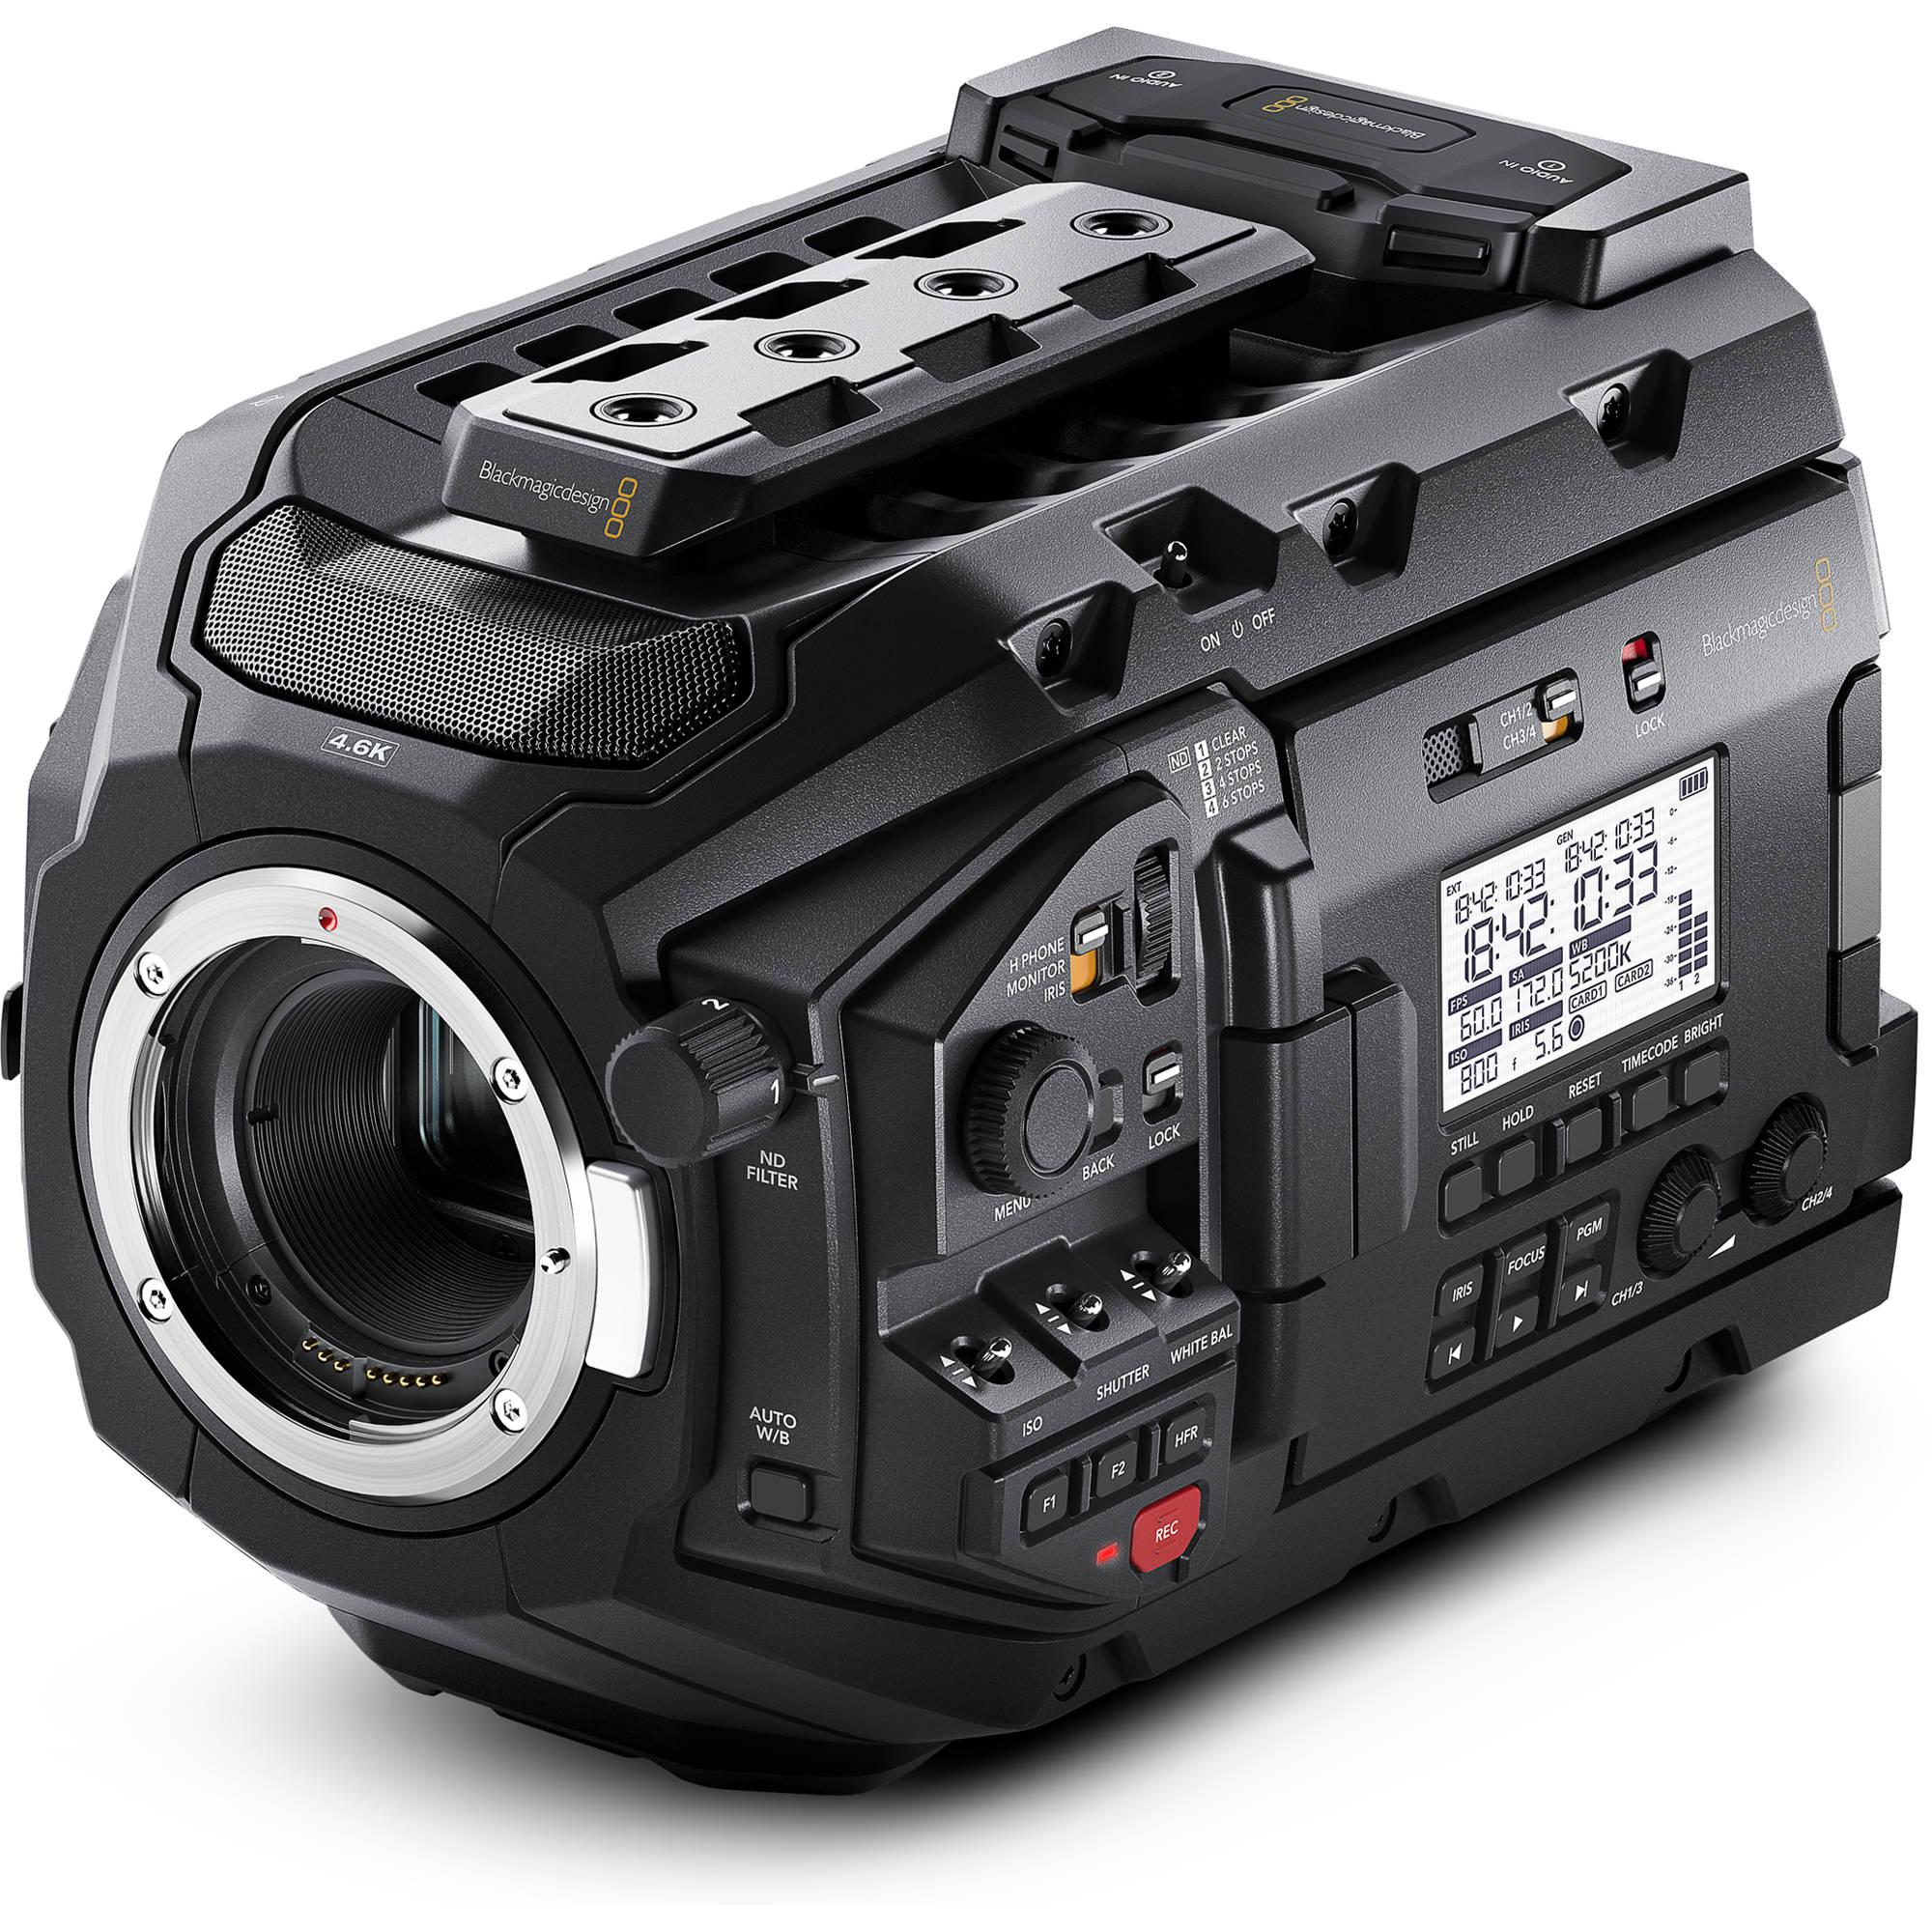 Blackmagic Design URSA Mini Pro 4 6K Digital Cinema Camera